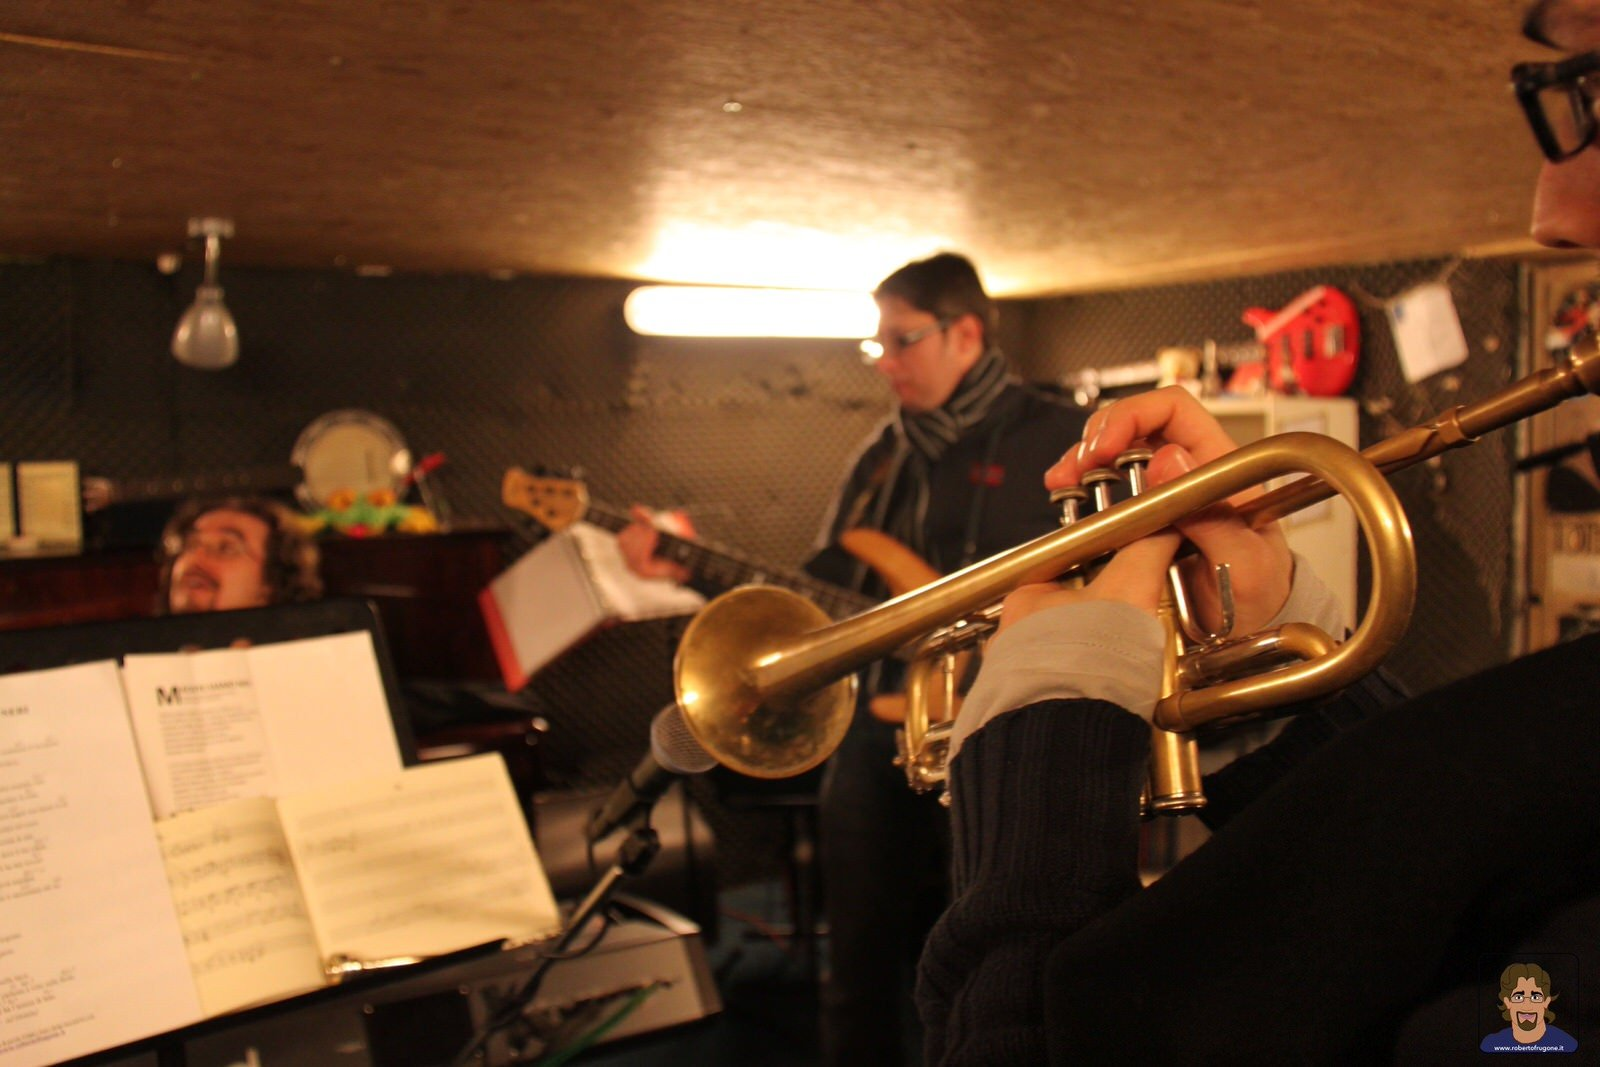 Totem Studio Sala Prove Musicali Casarza Ligure Roberto Frugone Band sessione 2010